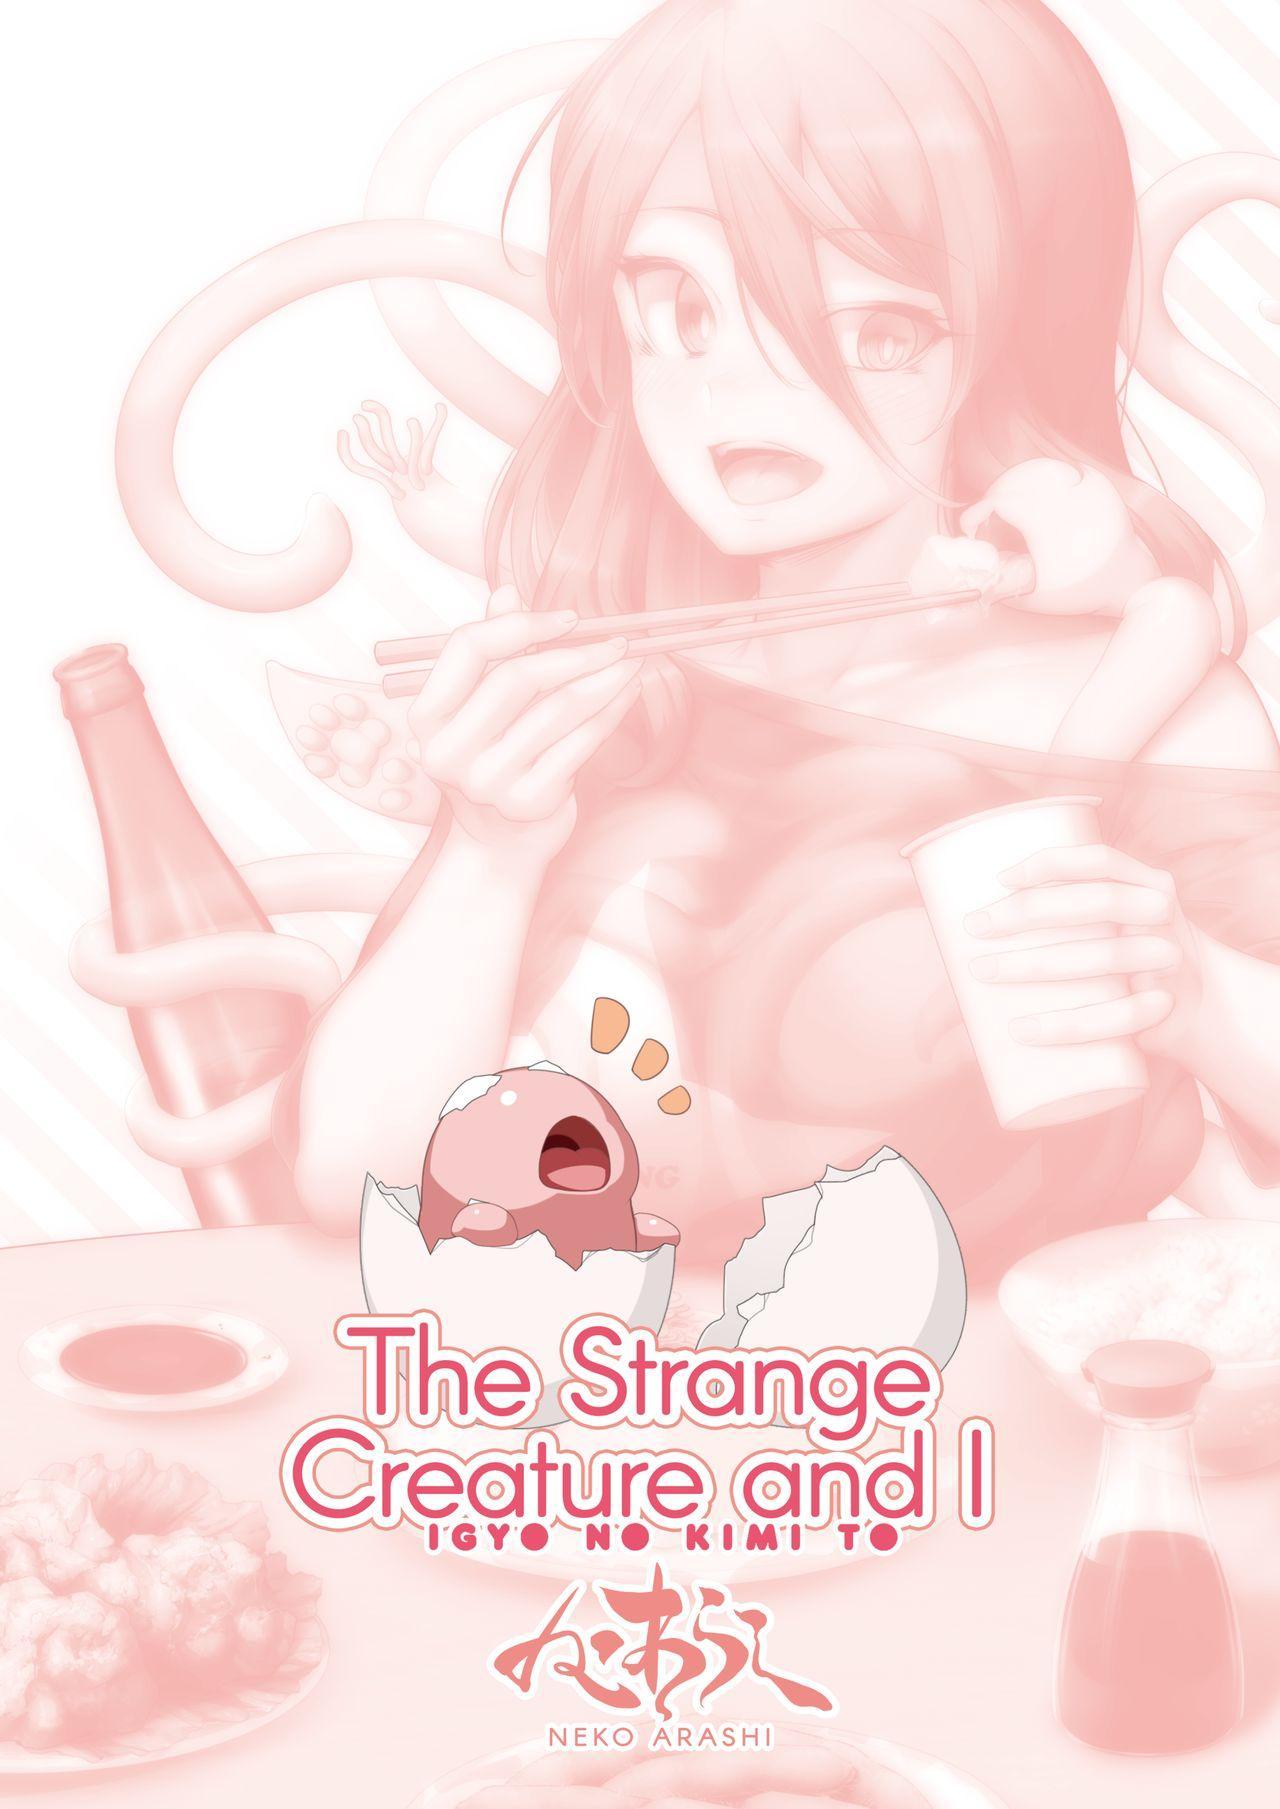 Igyo no Kimi to | The Strange Creature and I 47